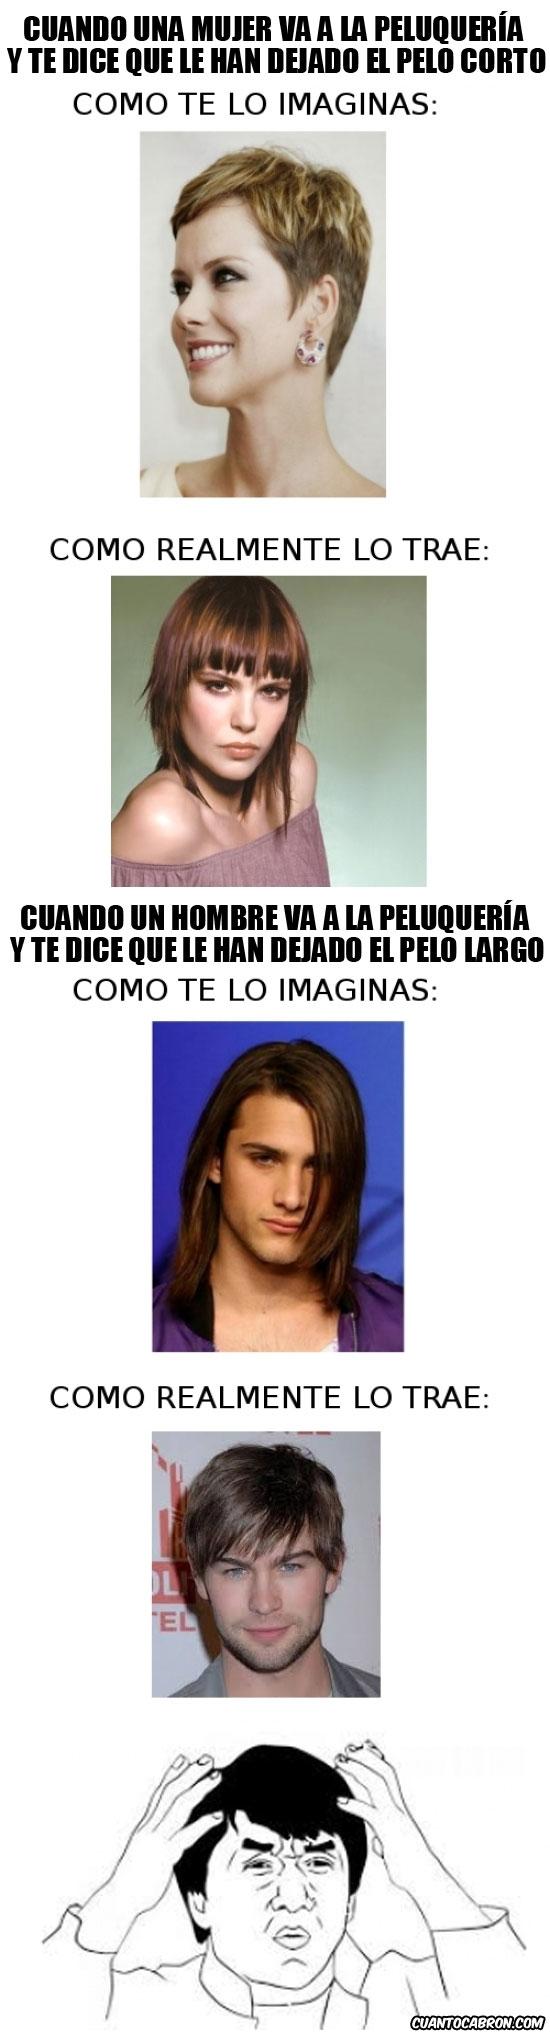 Mujeres con pelo largo memes